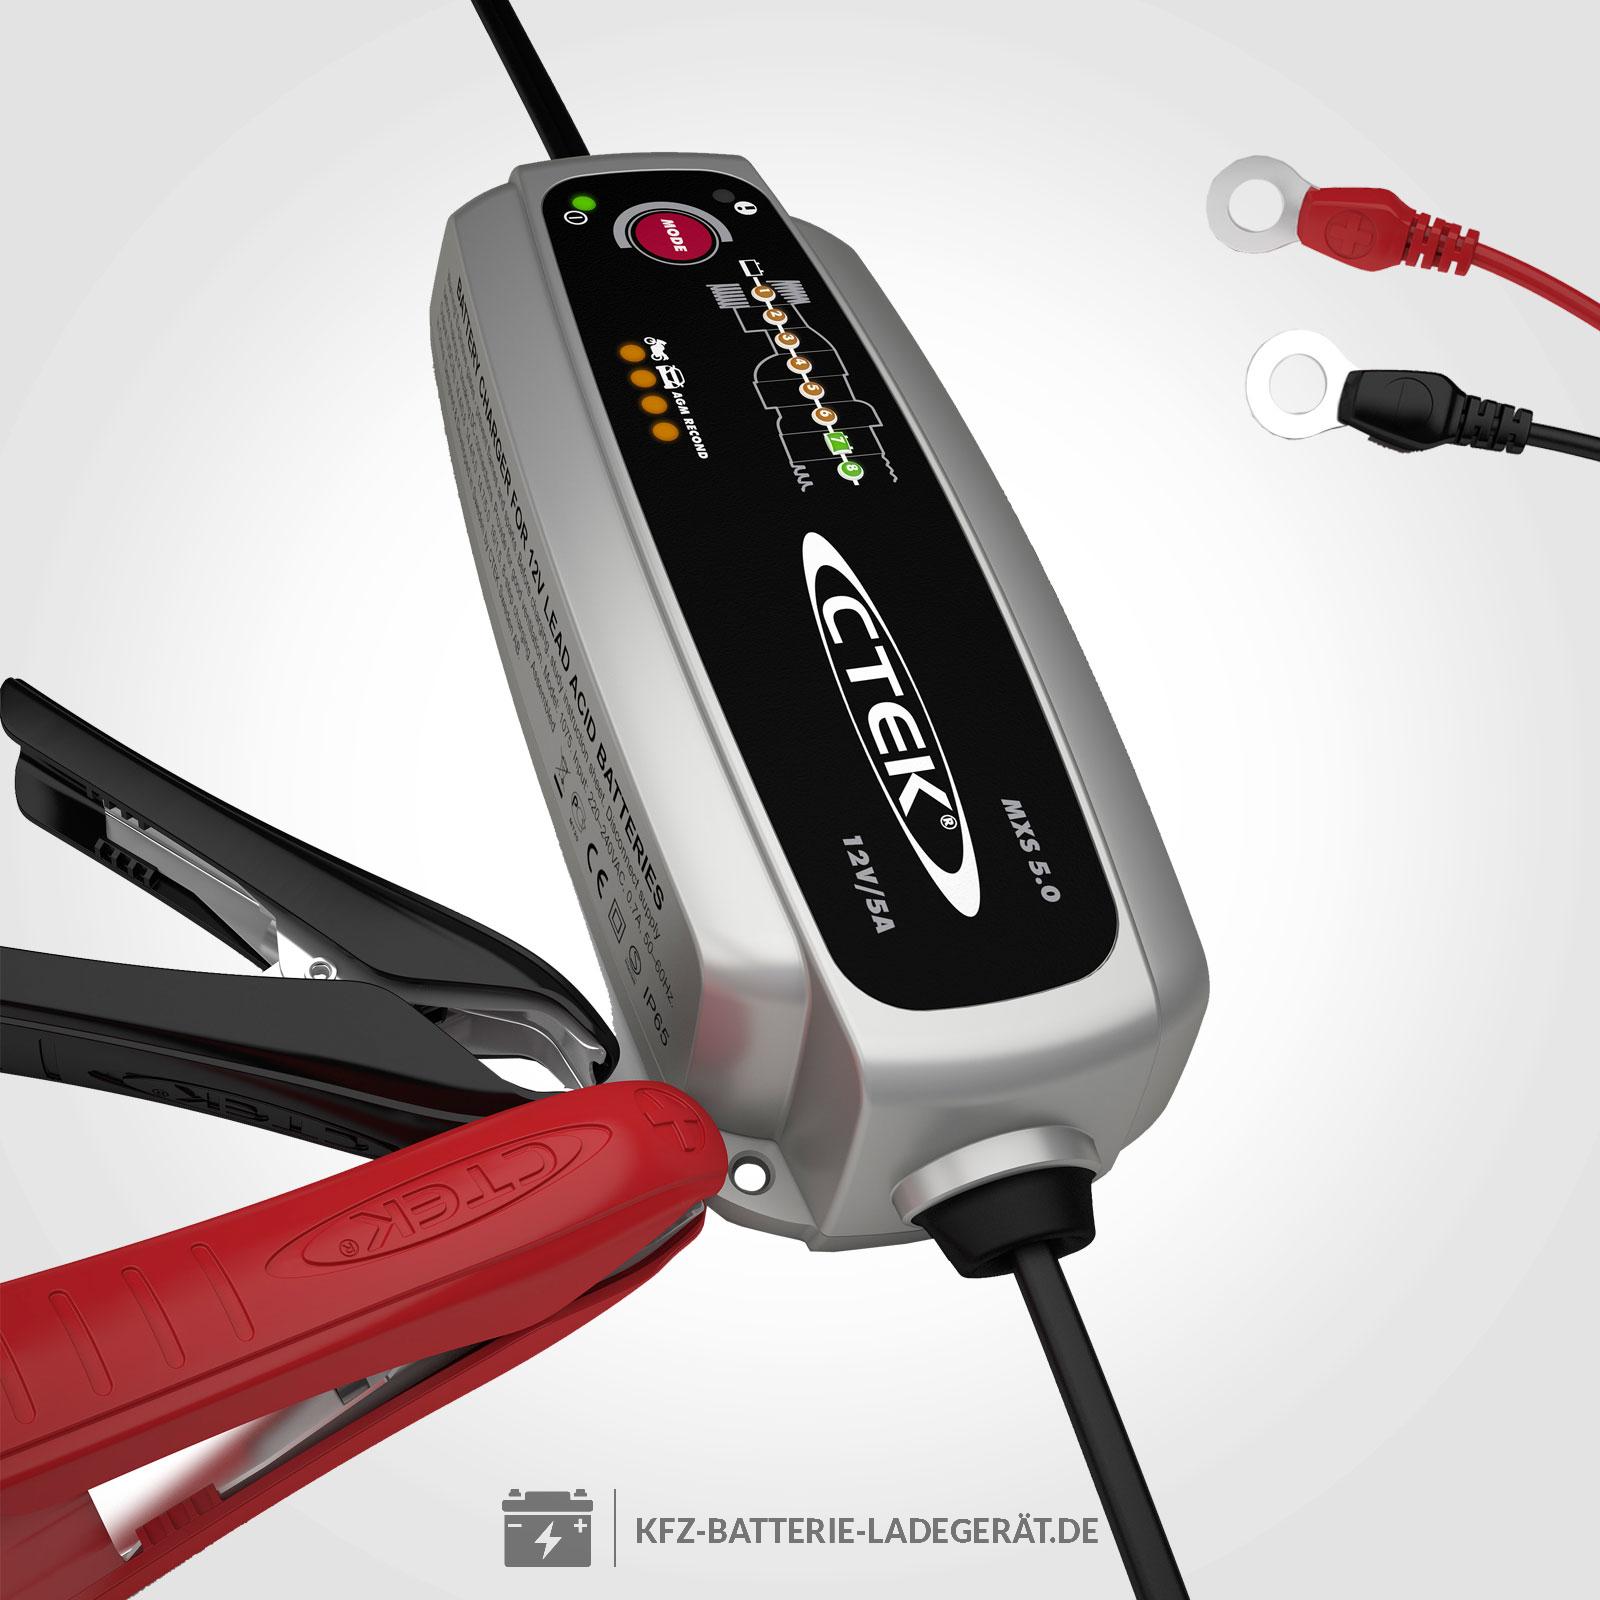 Icke gamla CTEK Batterie Ladegerät MXS 5.0 - CTEK Batterie Ladegeräte XJ-59